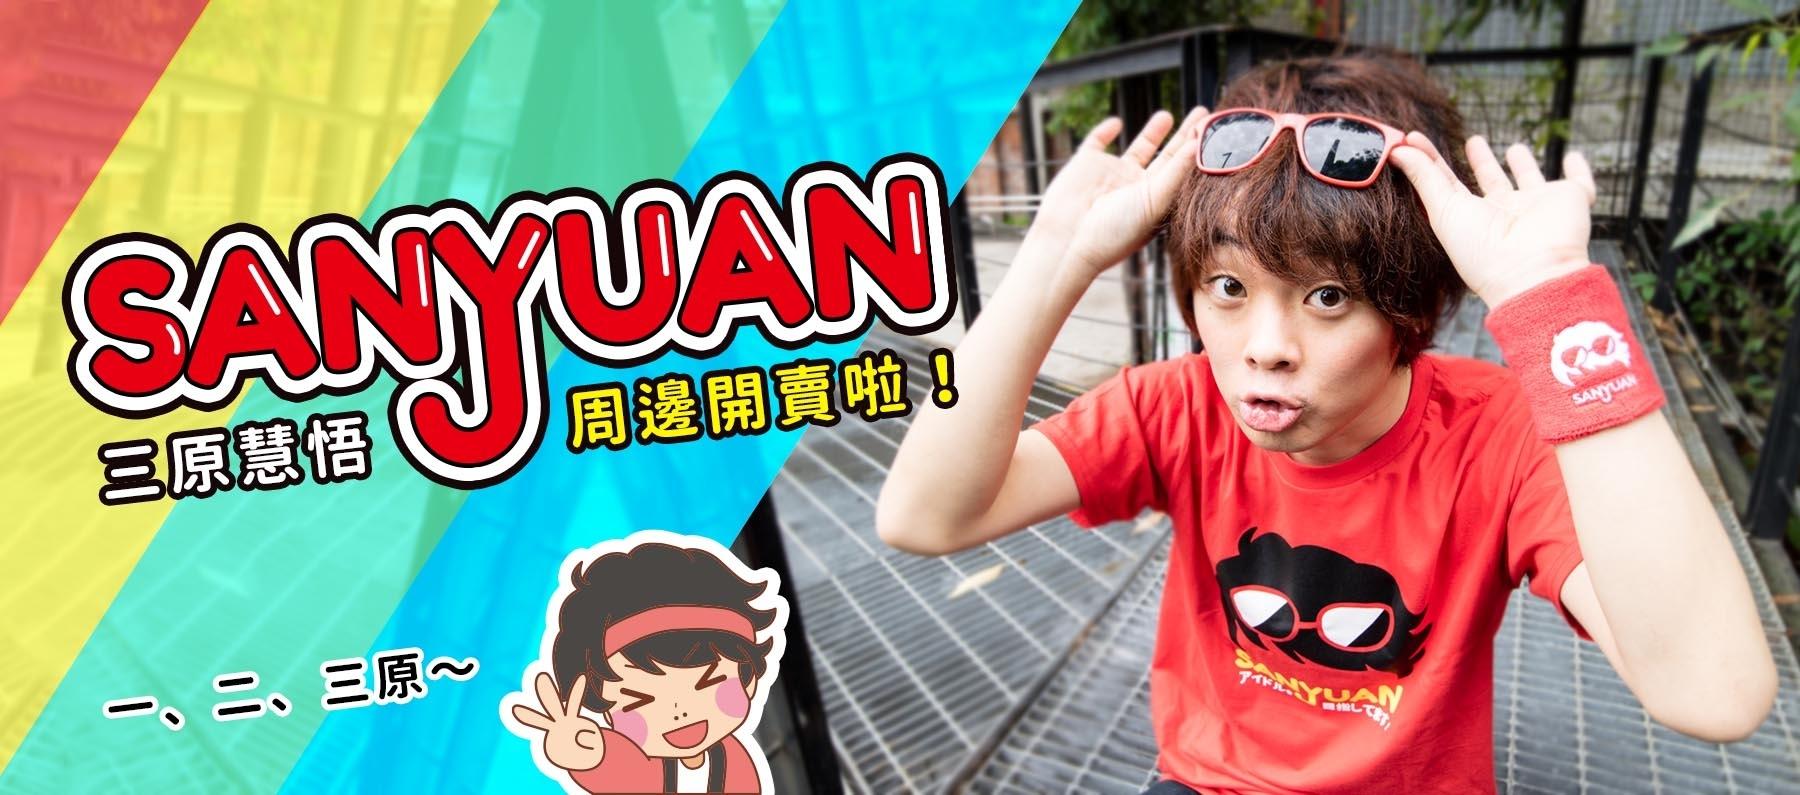 "<img src=""sanyuan.jpeg"" alt=""sanyuan-merchandise-store"">"